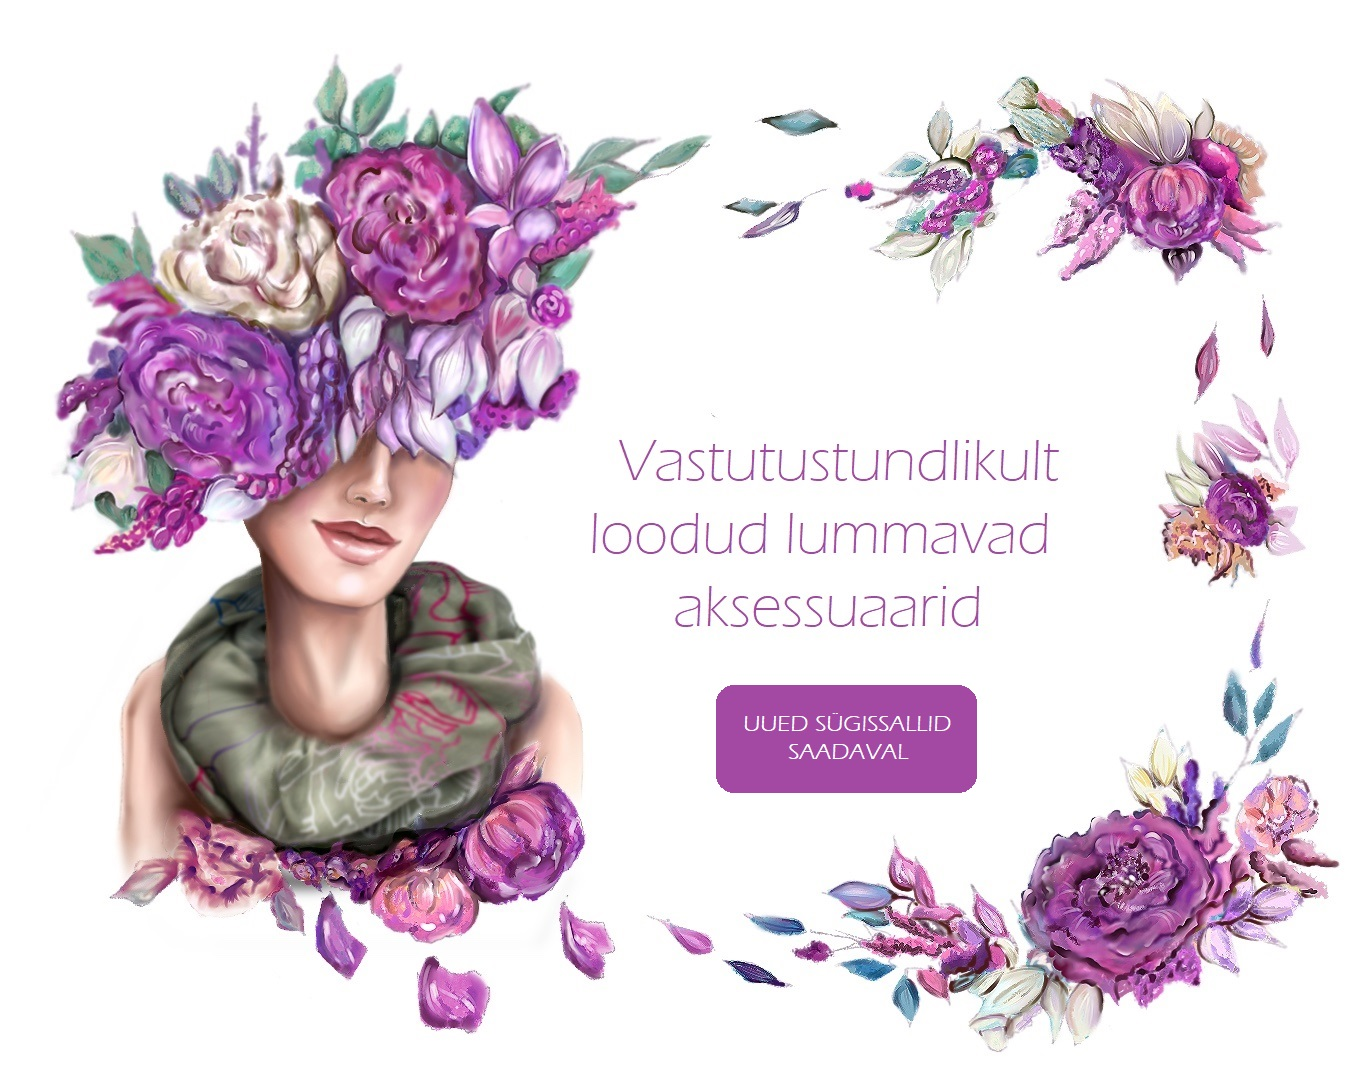 LOVÉN BÄNNER eesti keeles sügis 2021